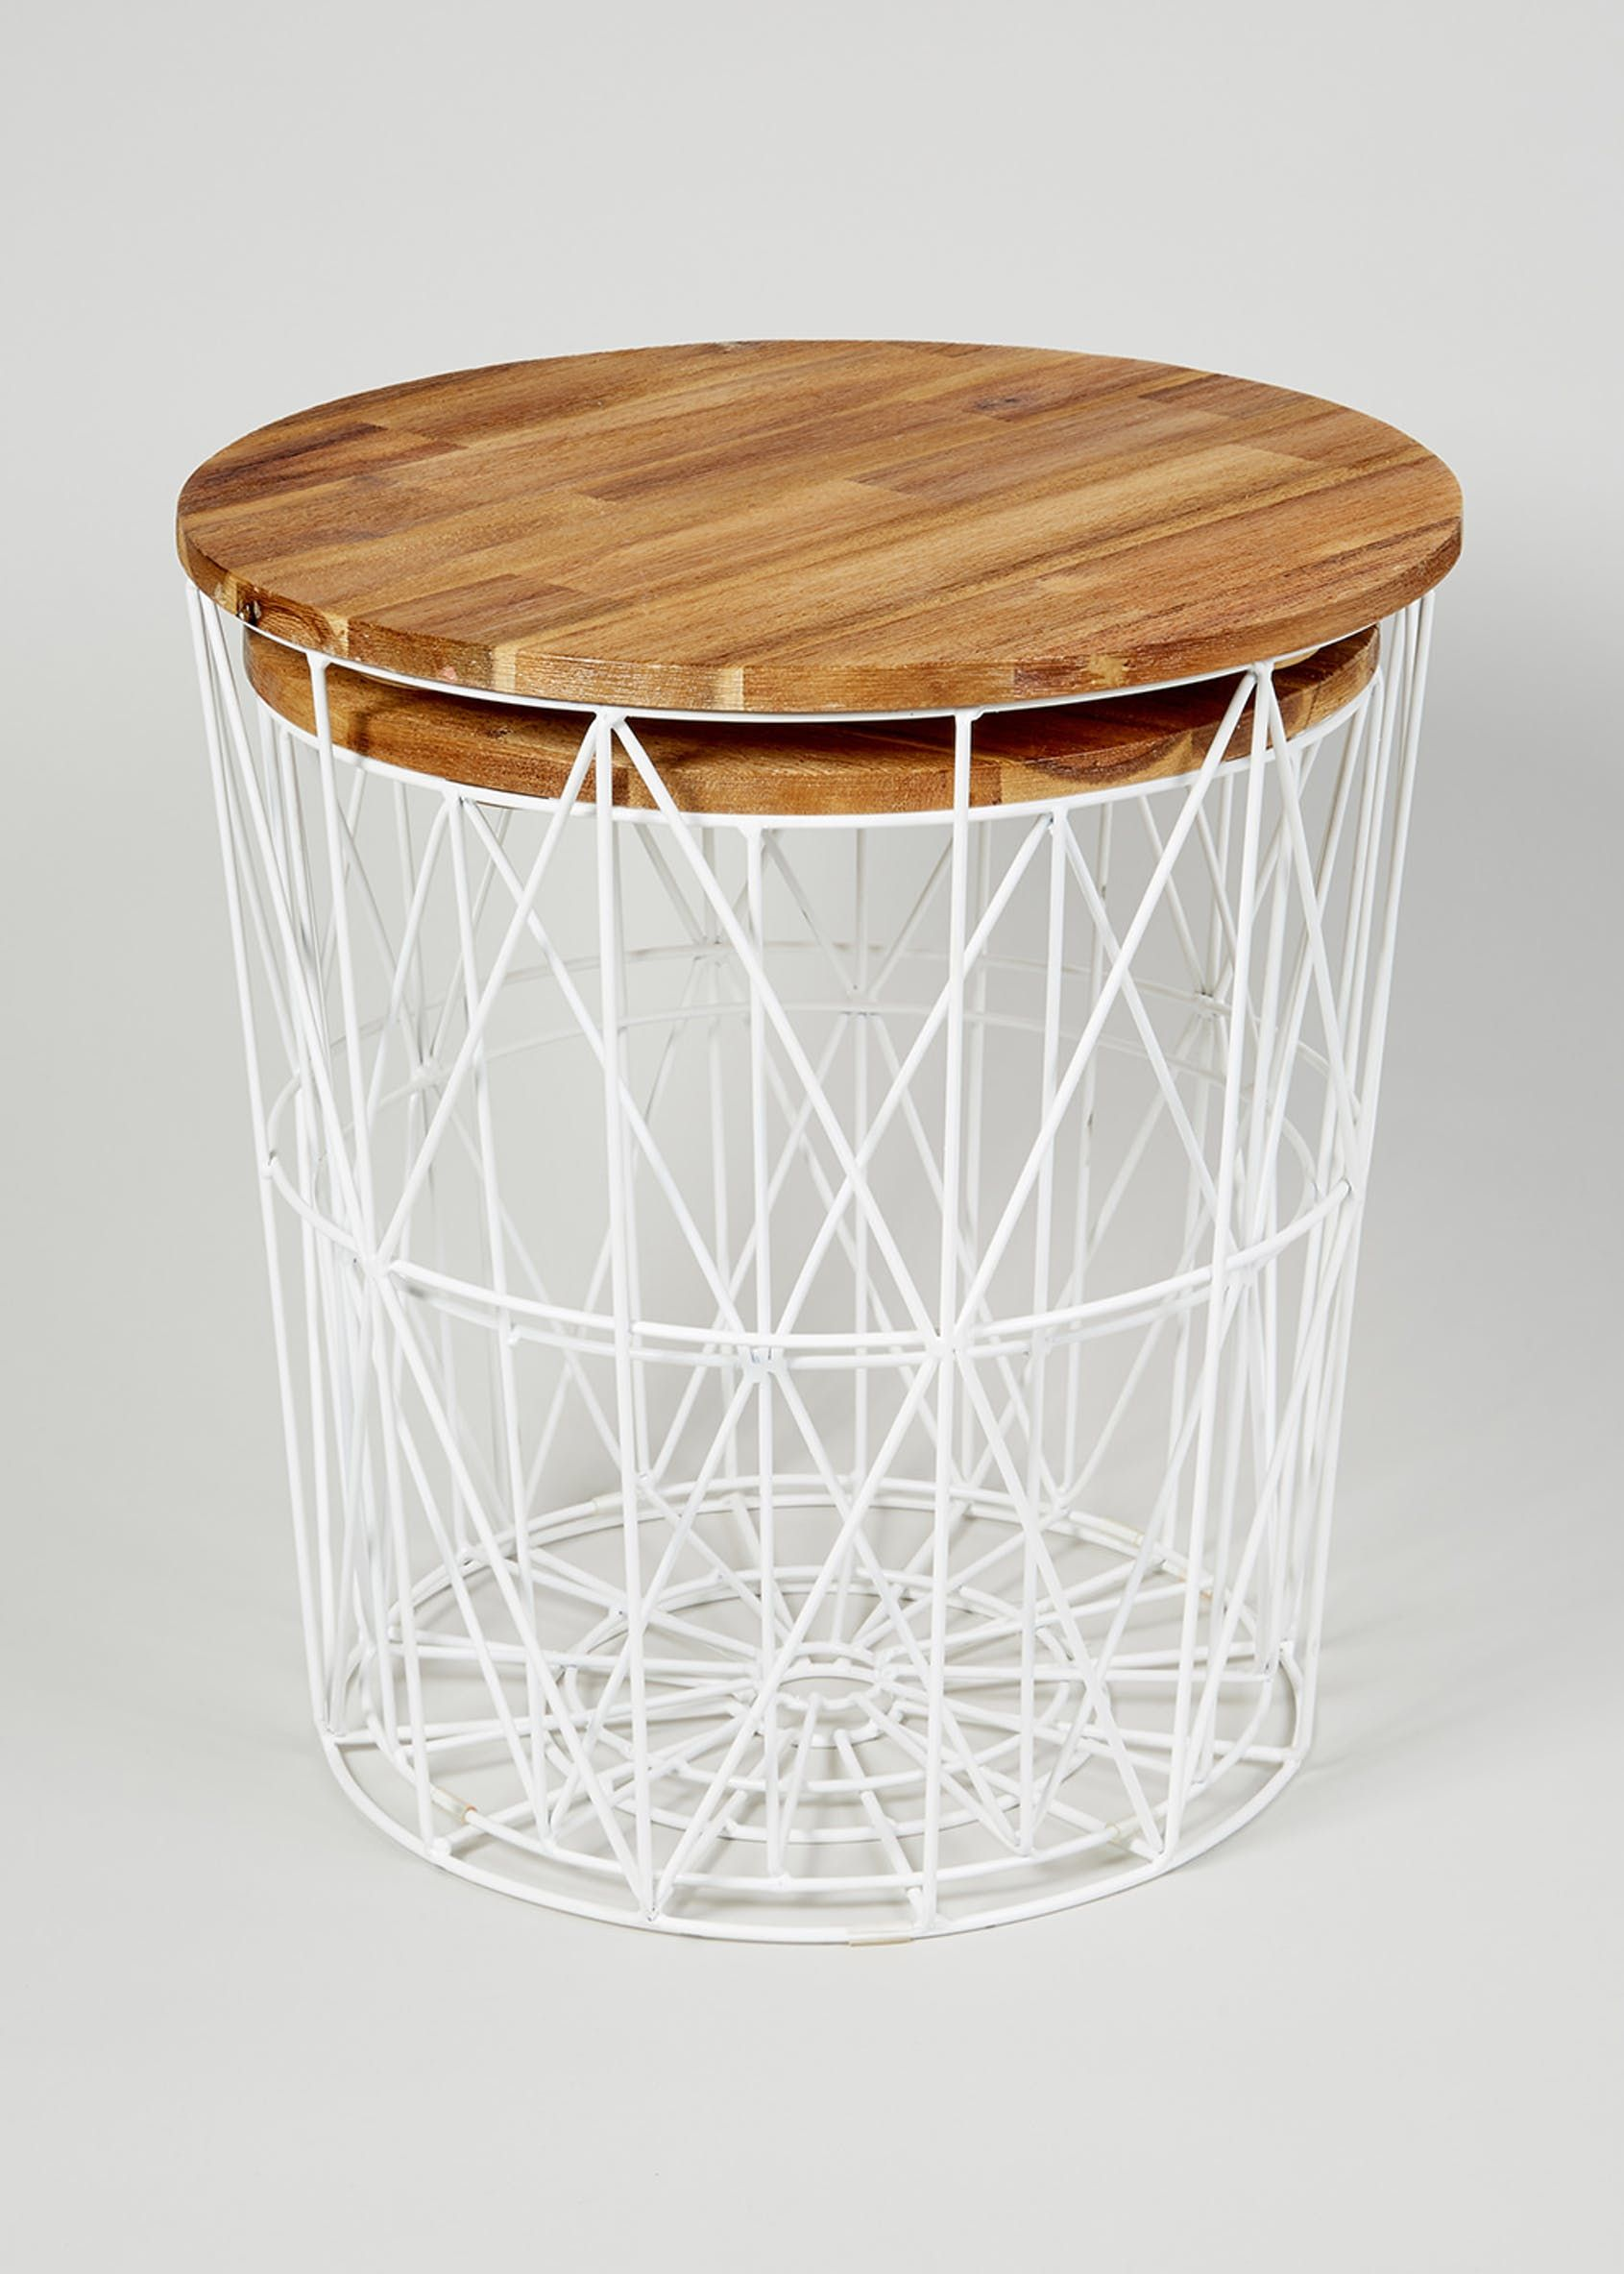 super popular 4a984 4010e Jaxson Nesting Side Table (H48cm x W45cm) – Natural   House ...